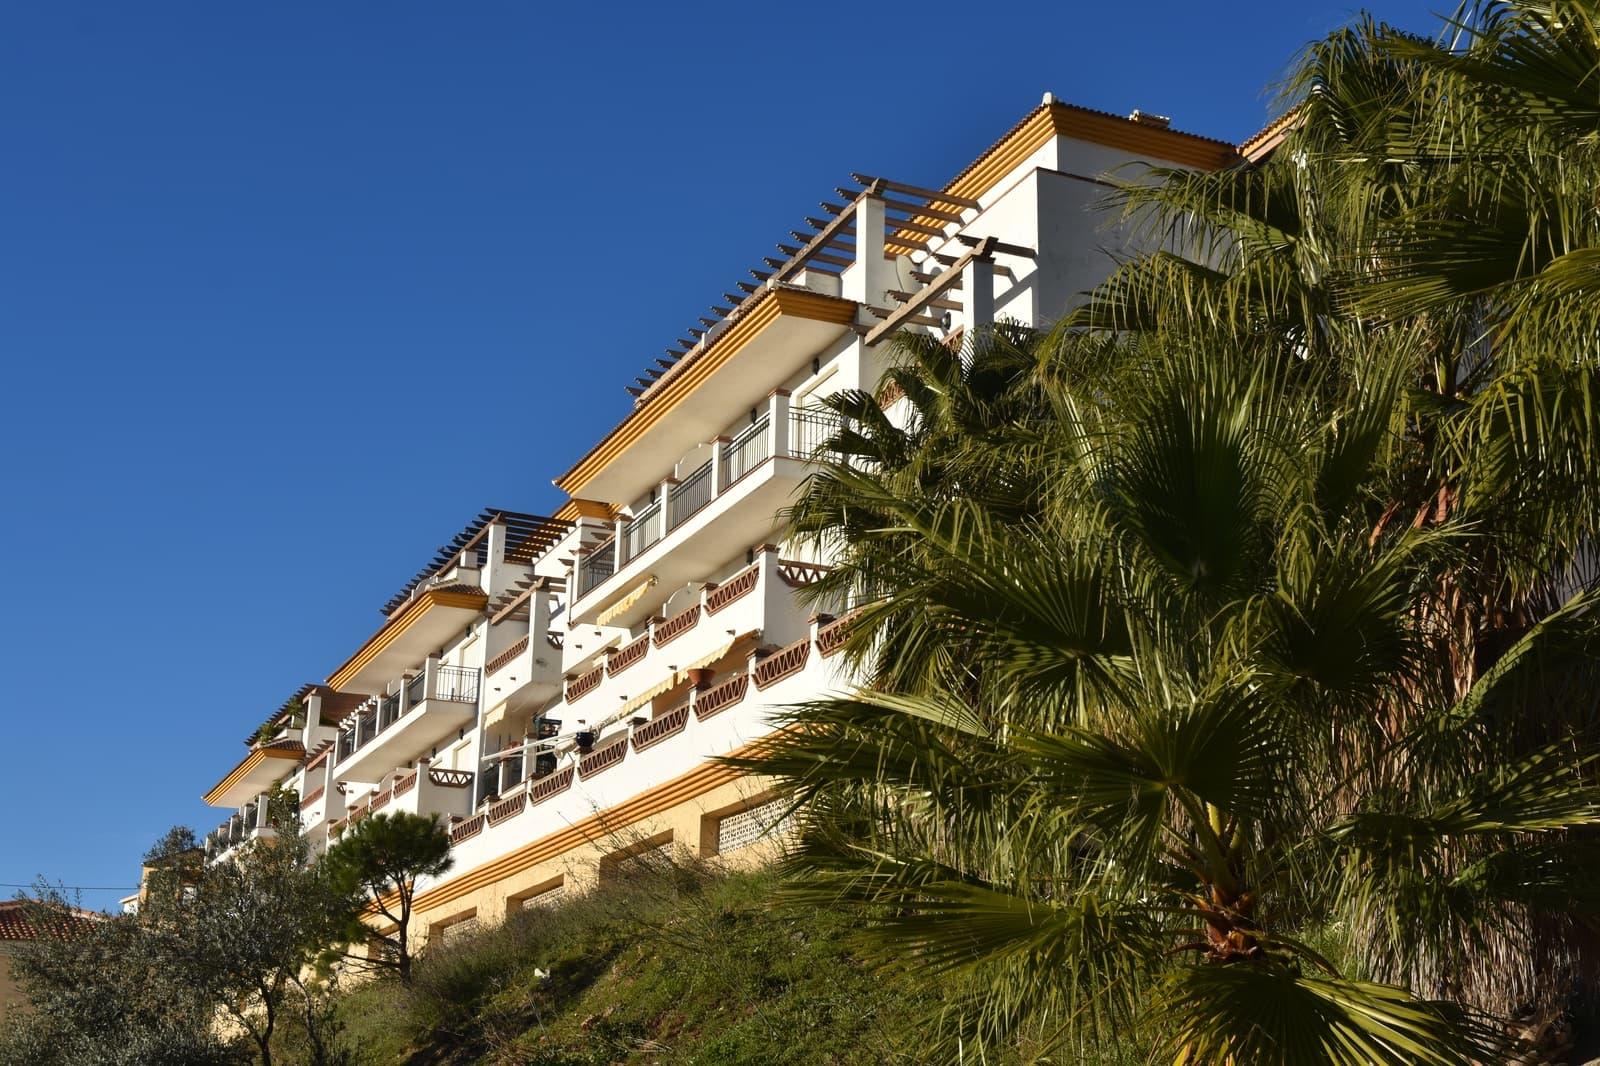 2 bedroom Apartment for sale in Alcaucin - € 95,000 (Ref: 4365572)